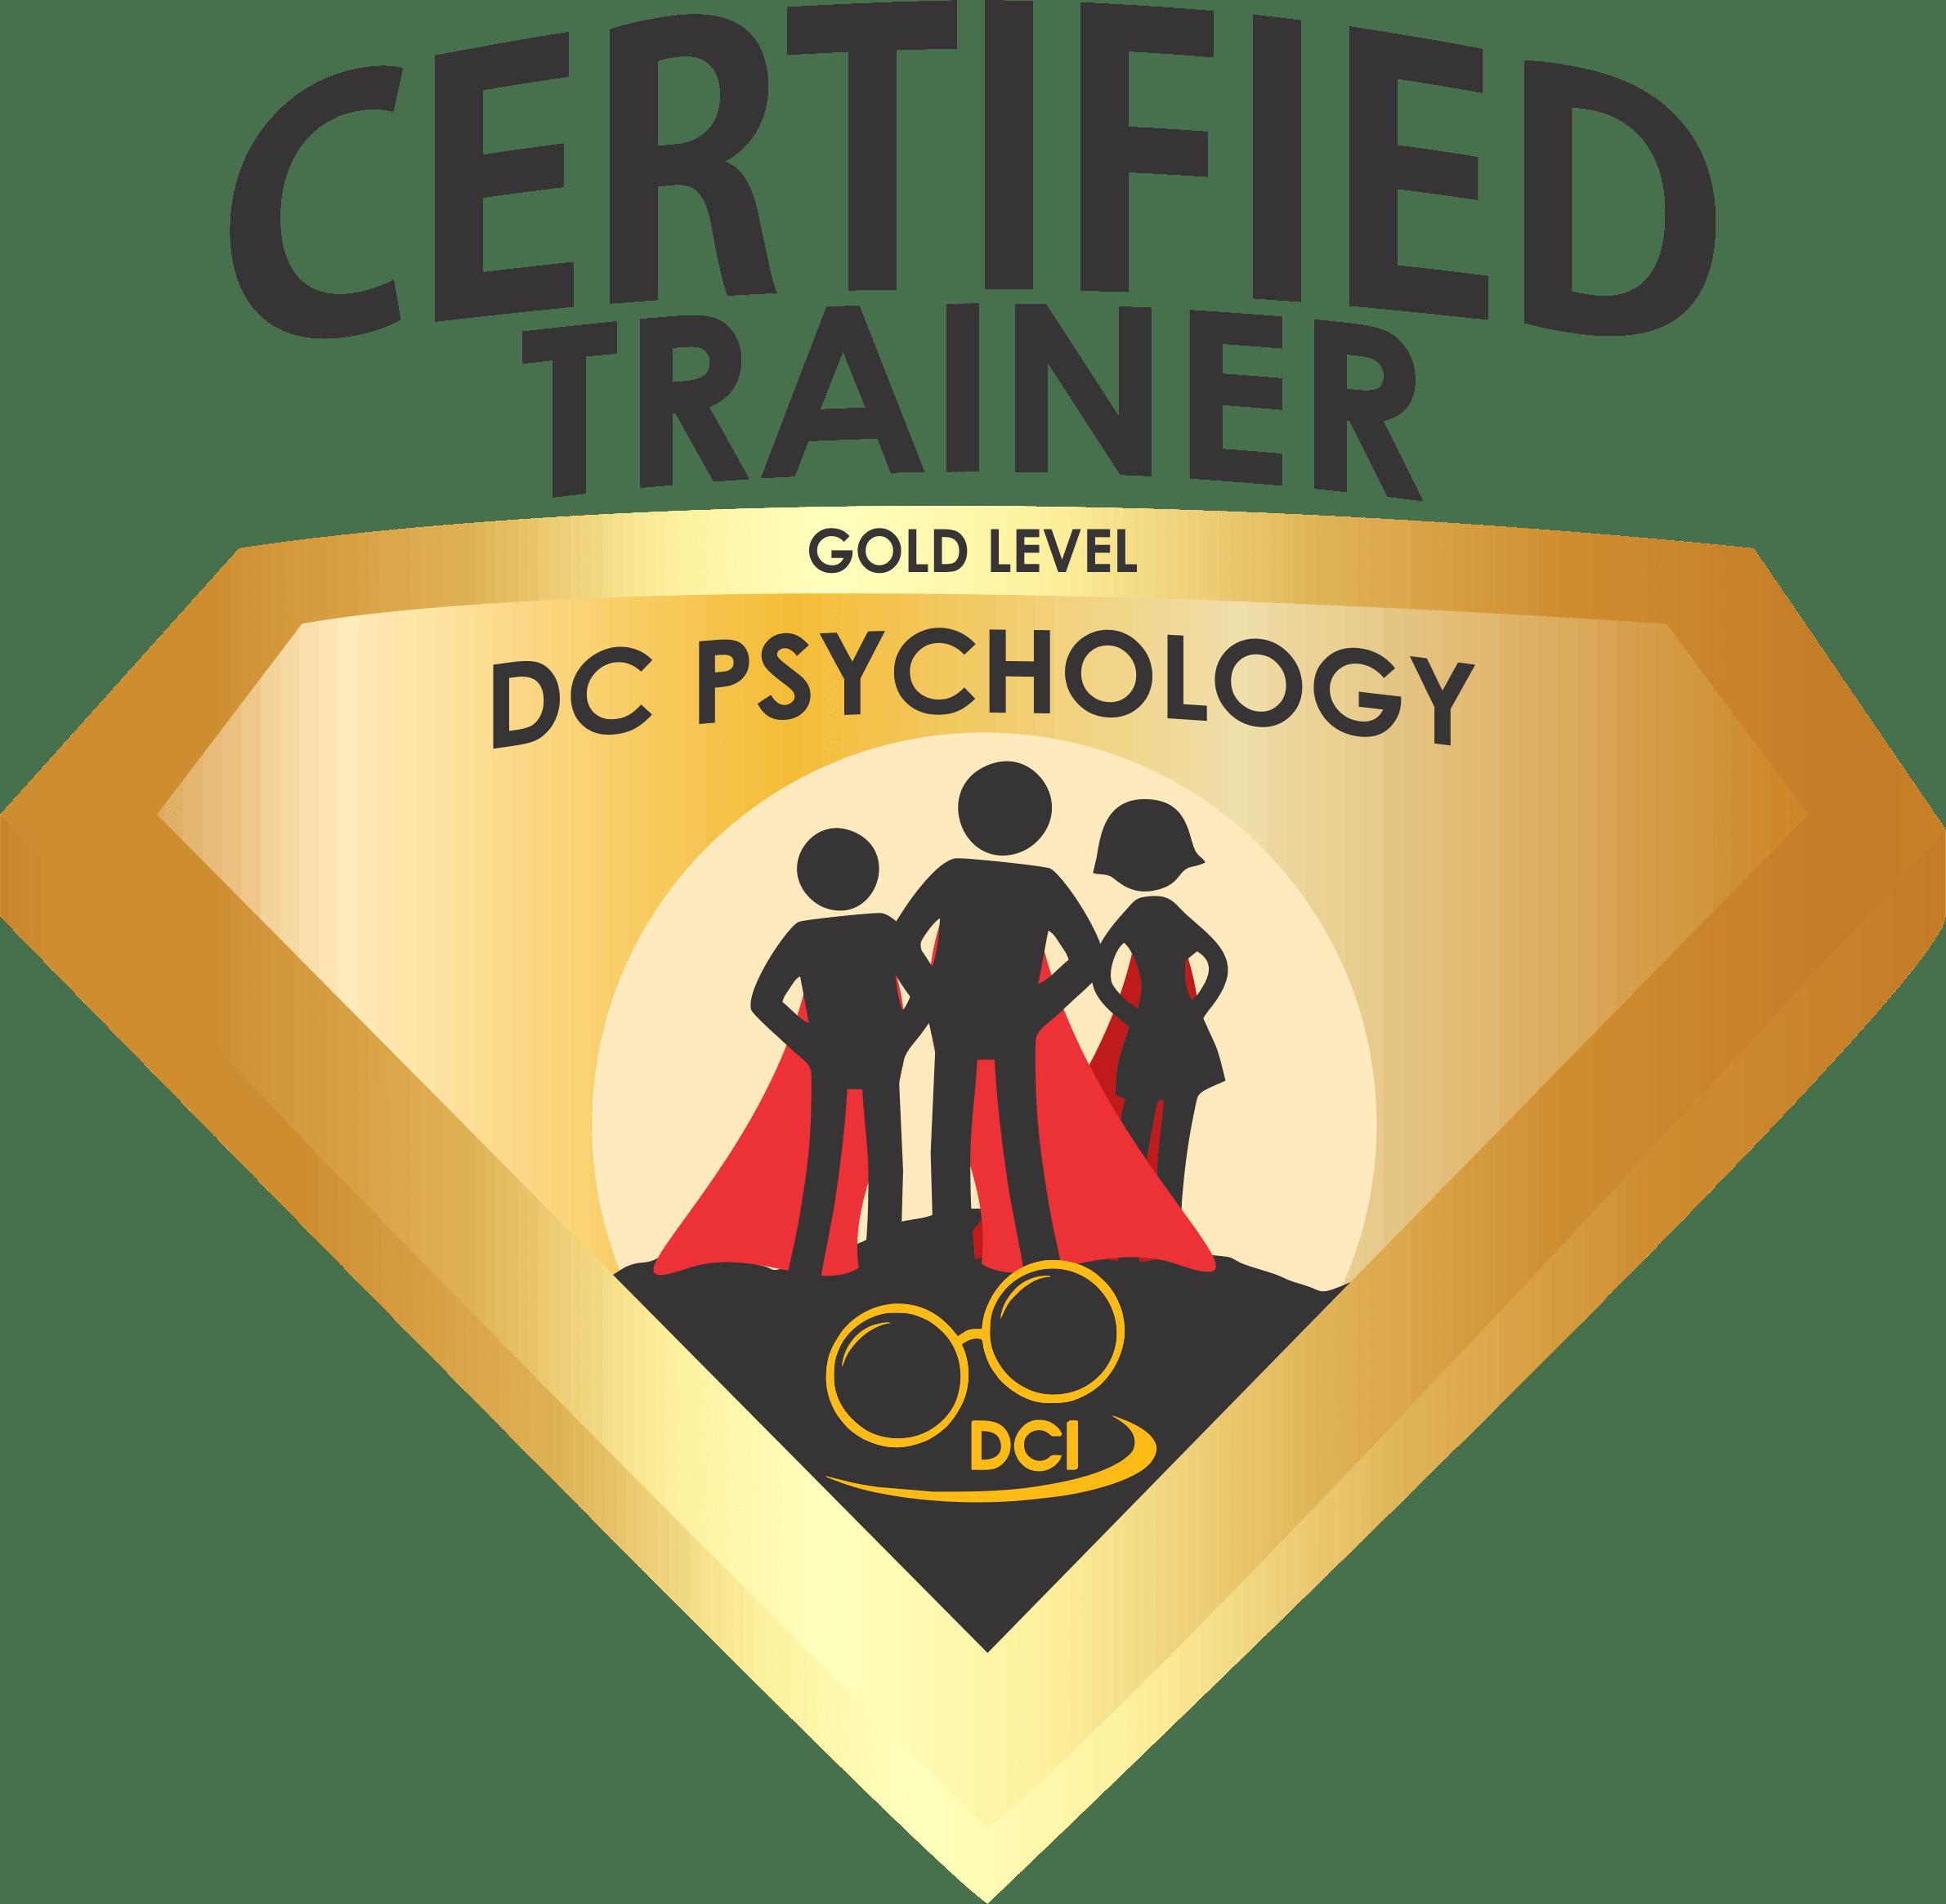 Achievement-Level-Certification-certified-trainer-gold